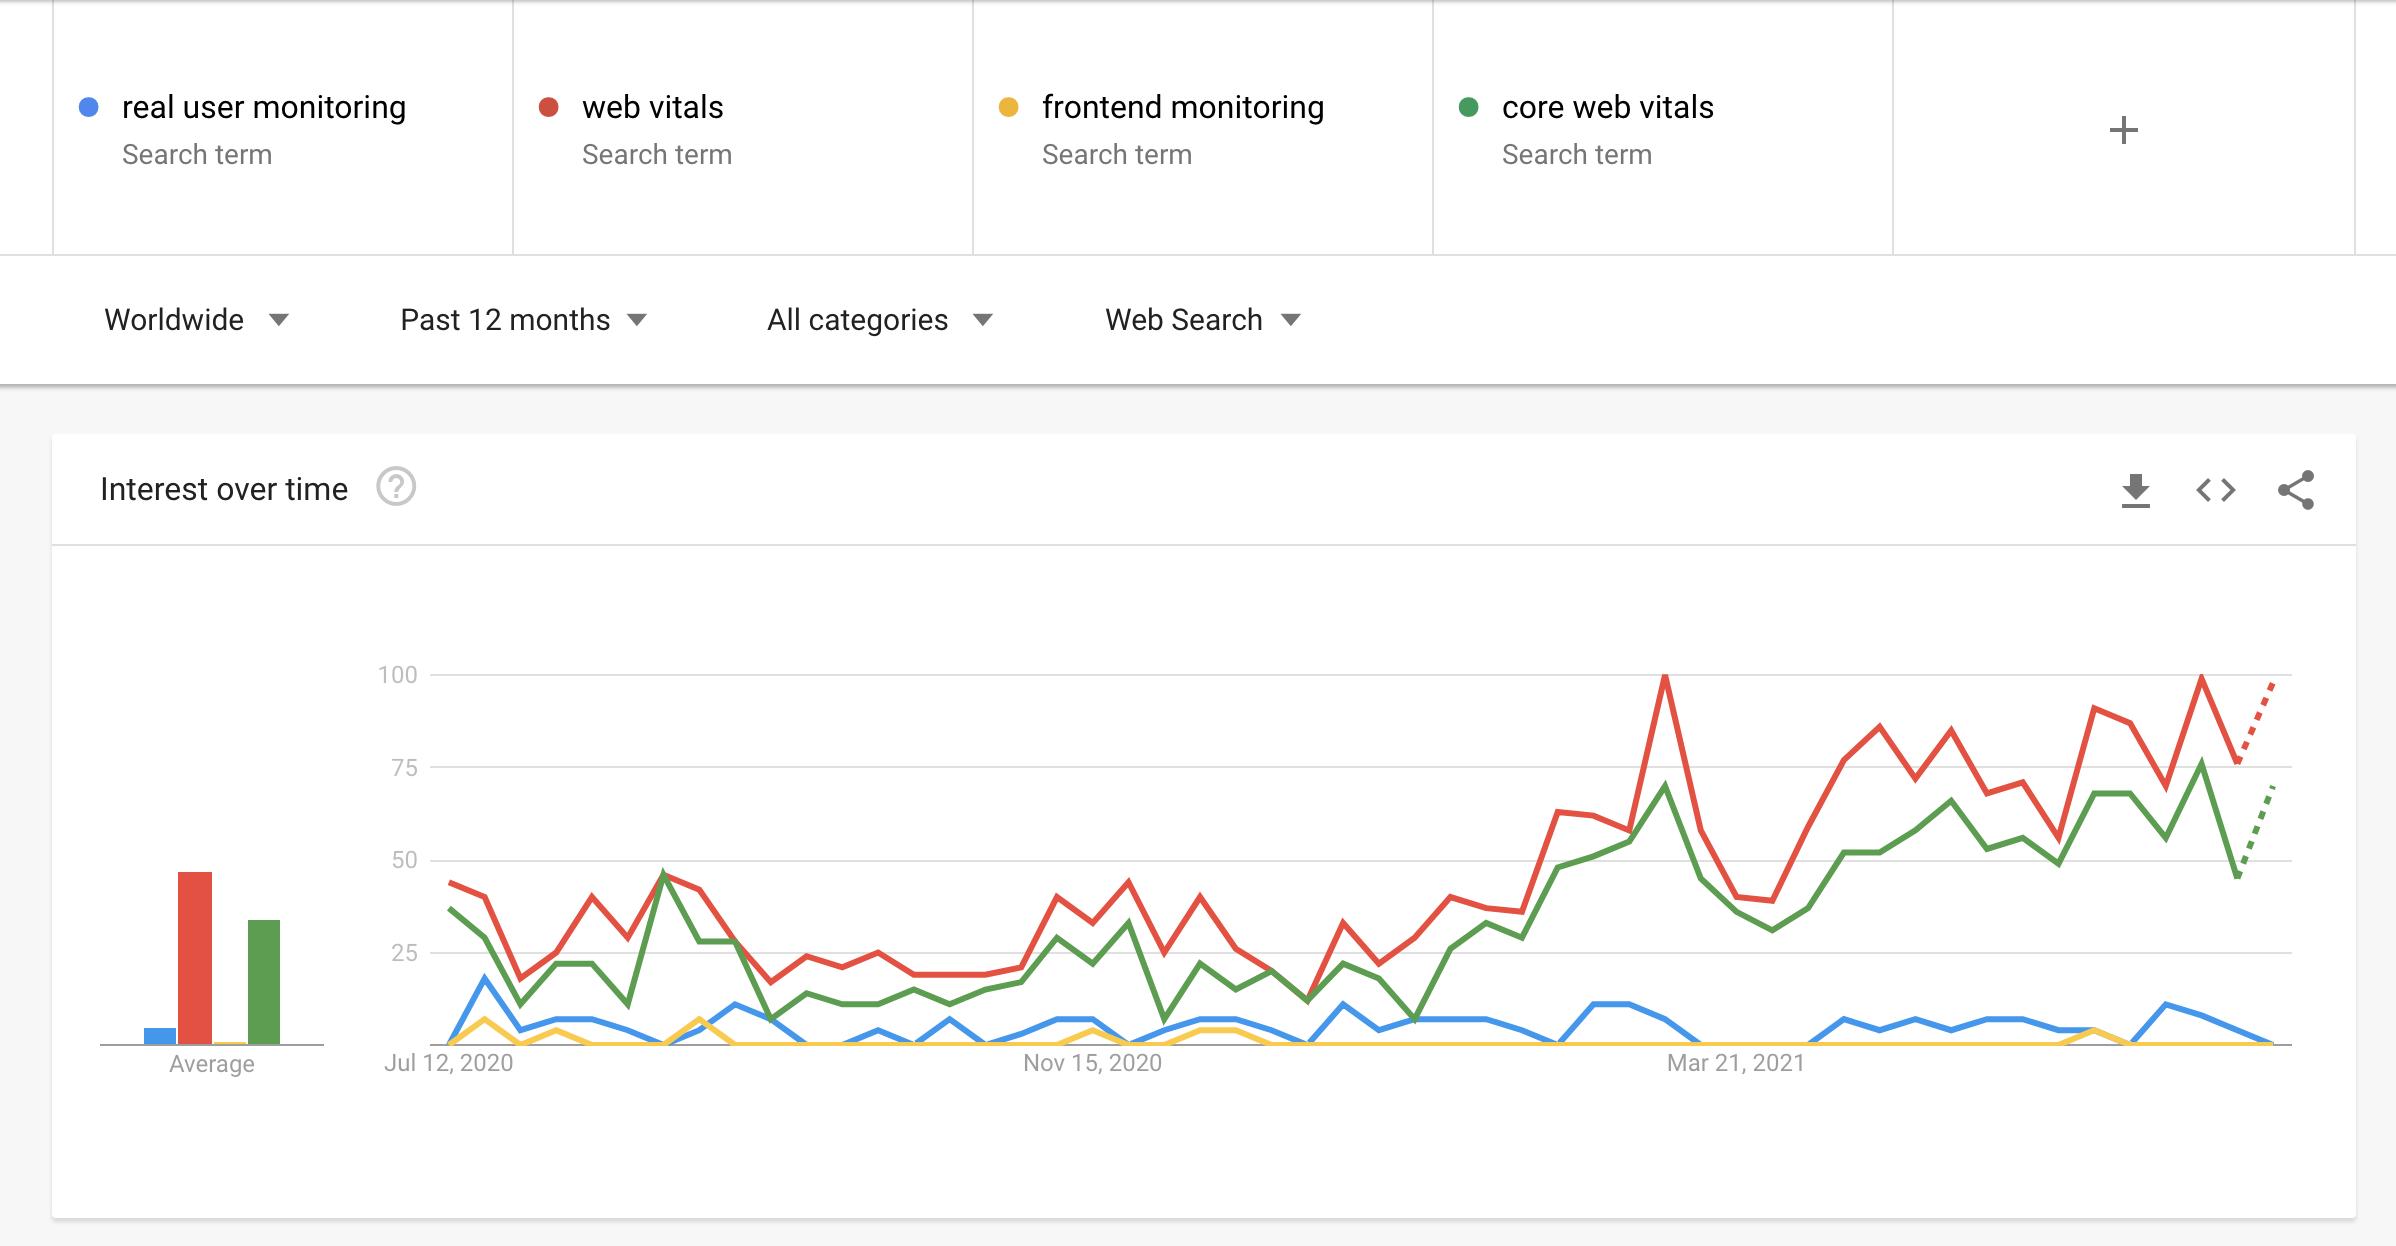 Google Trends results for Juli 2021